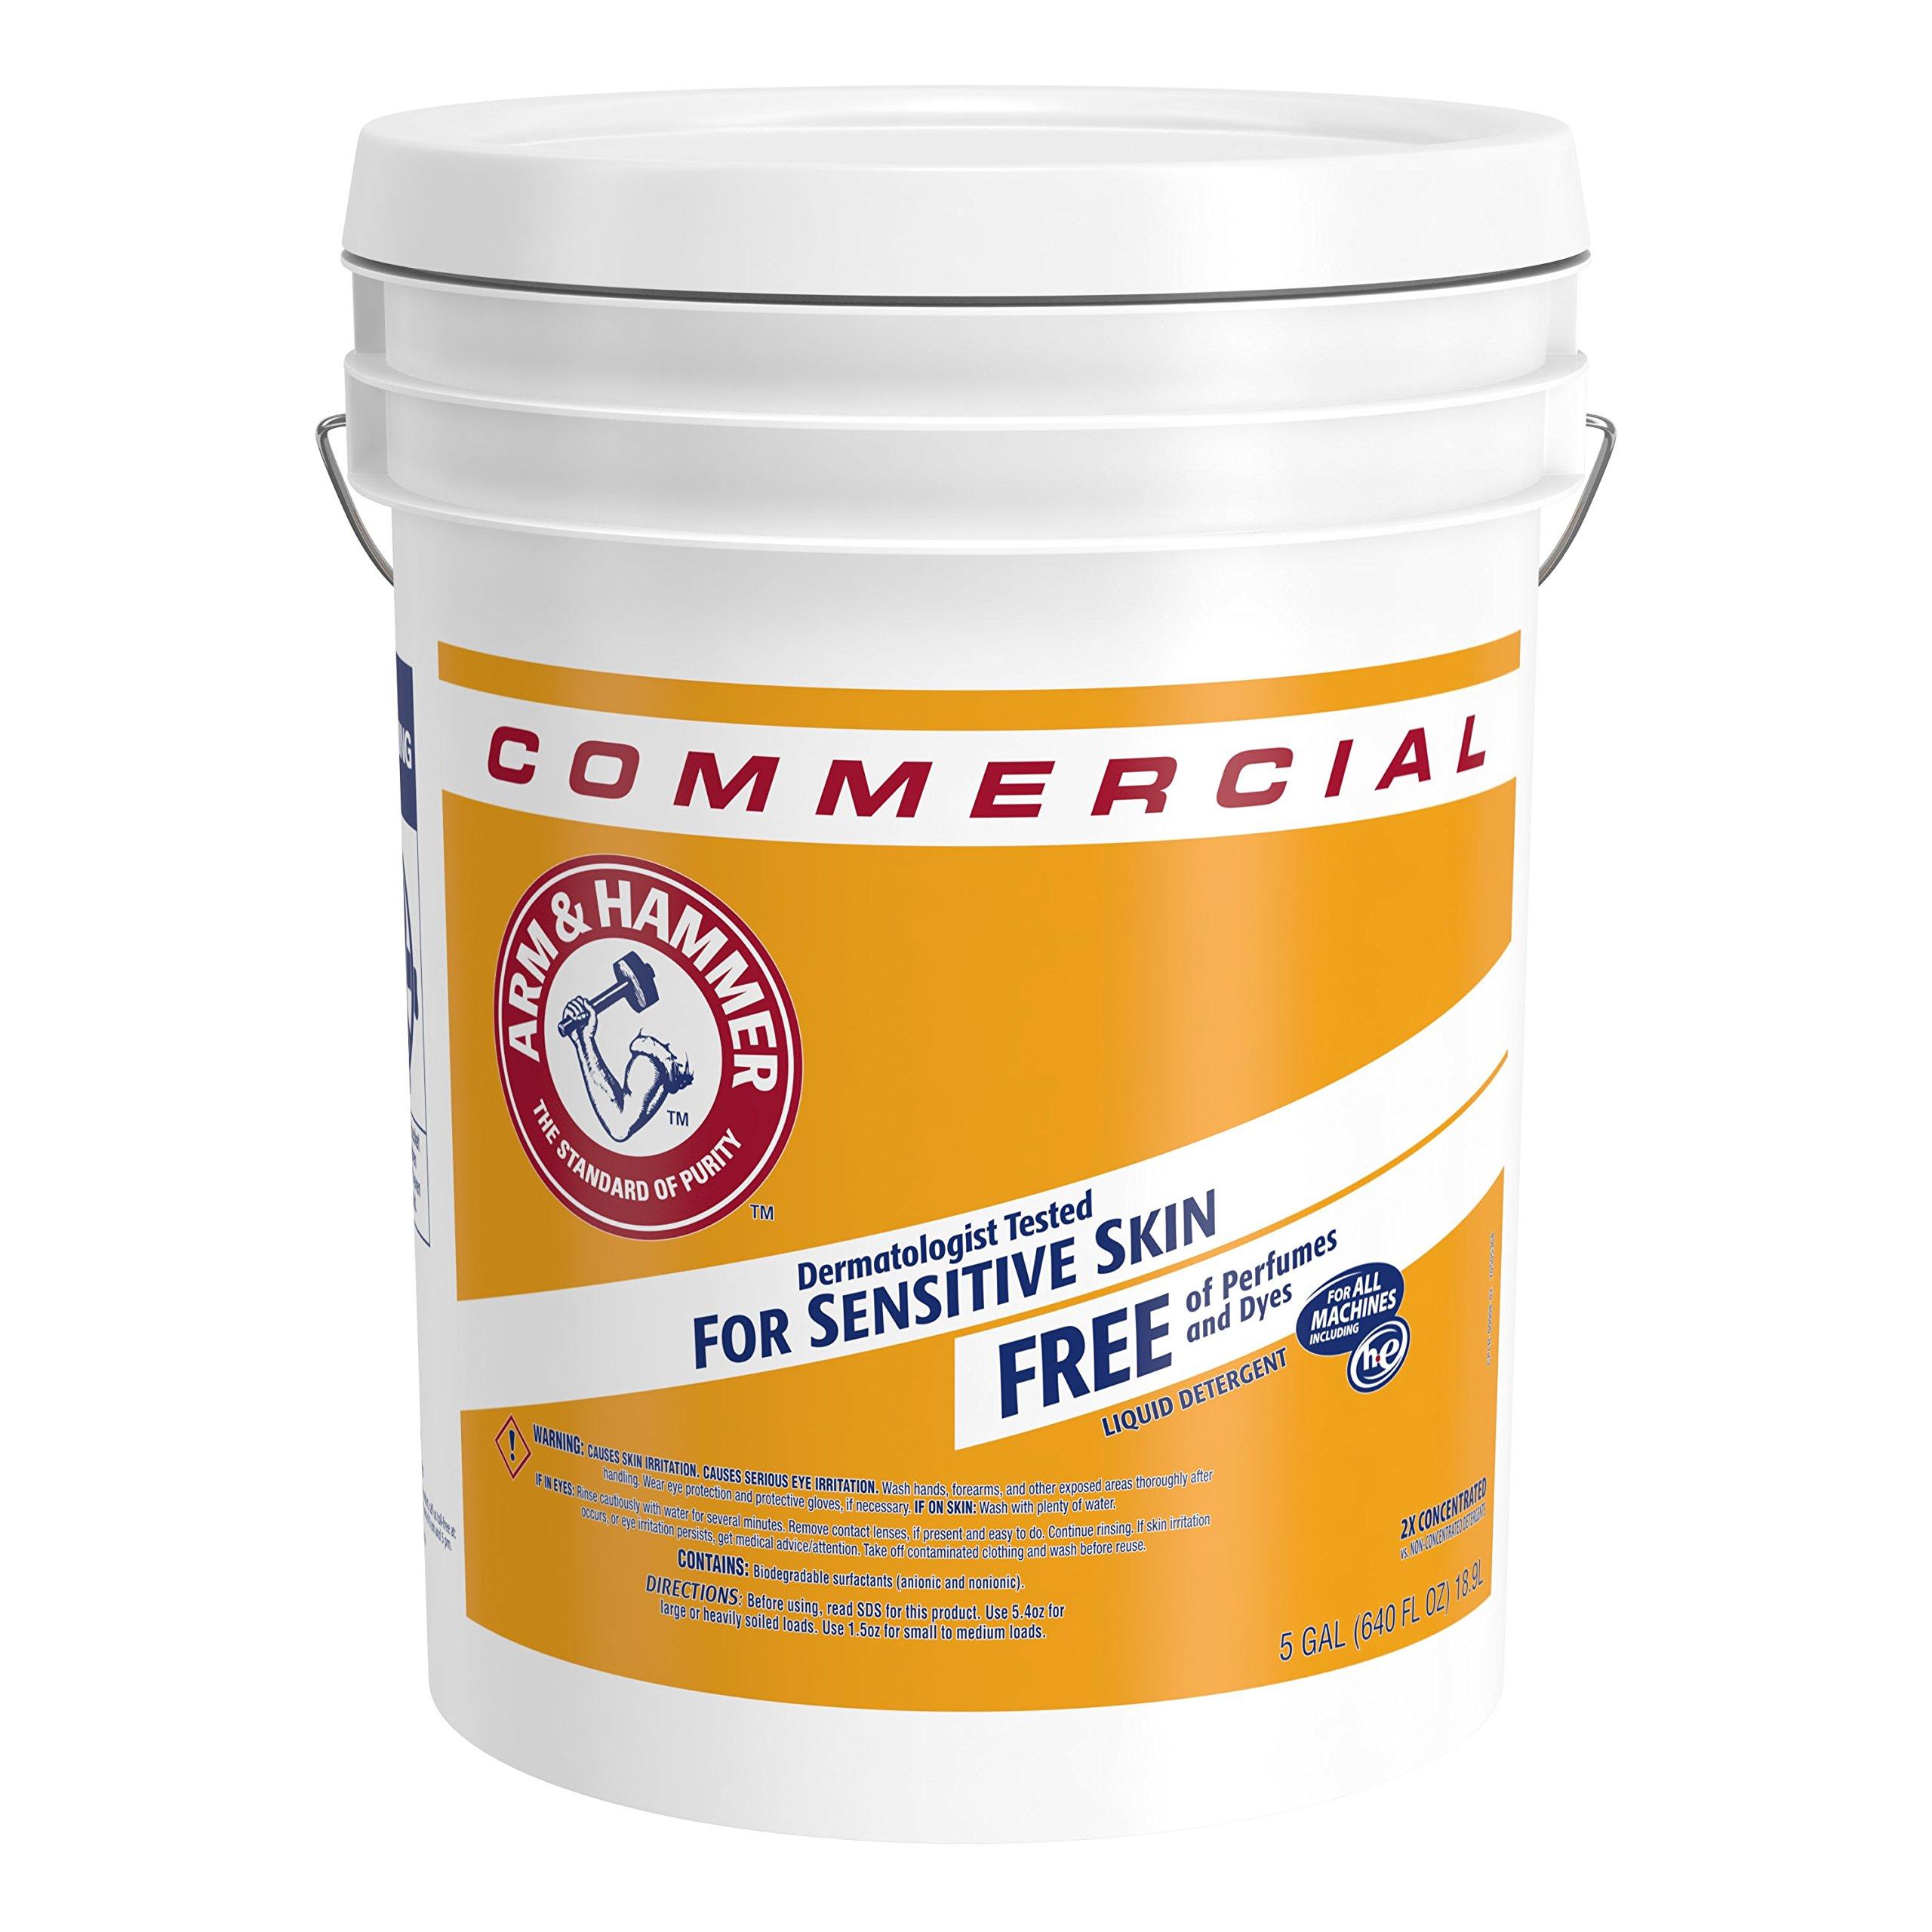 Arm & Hammer 33200-00008 Laundry Detergent Perfume/Dye Free, Liquid, 5 gal, 640 fl. oz. by Arm & Hammer